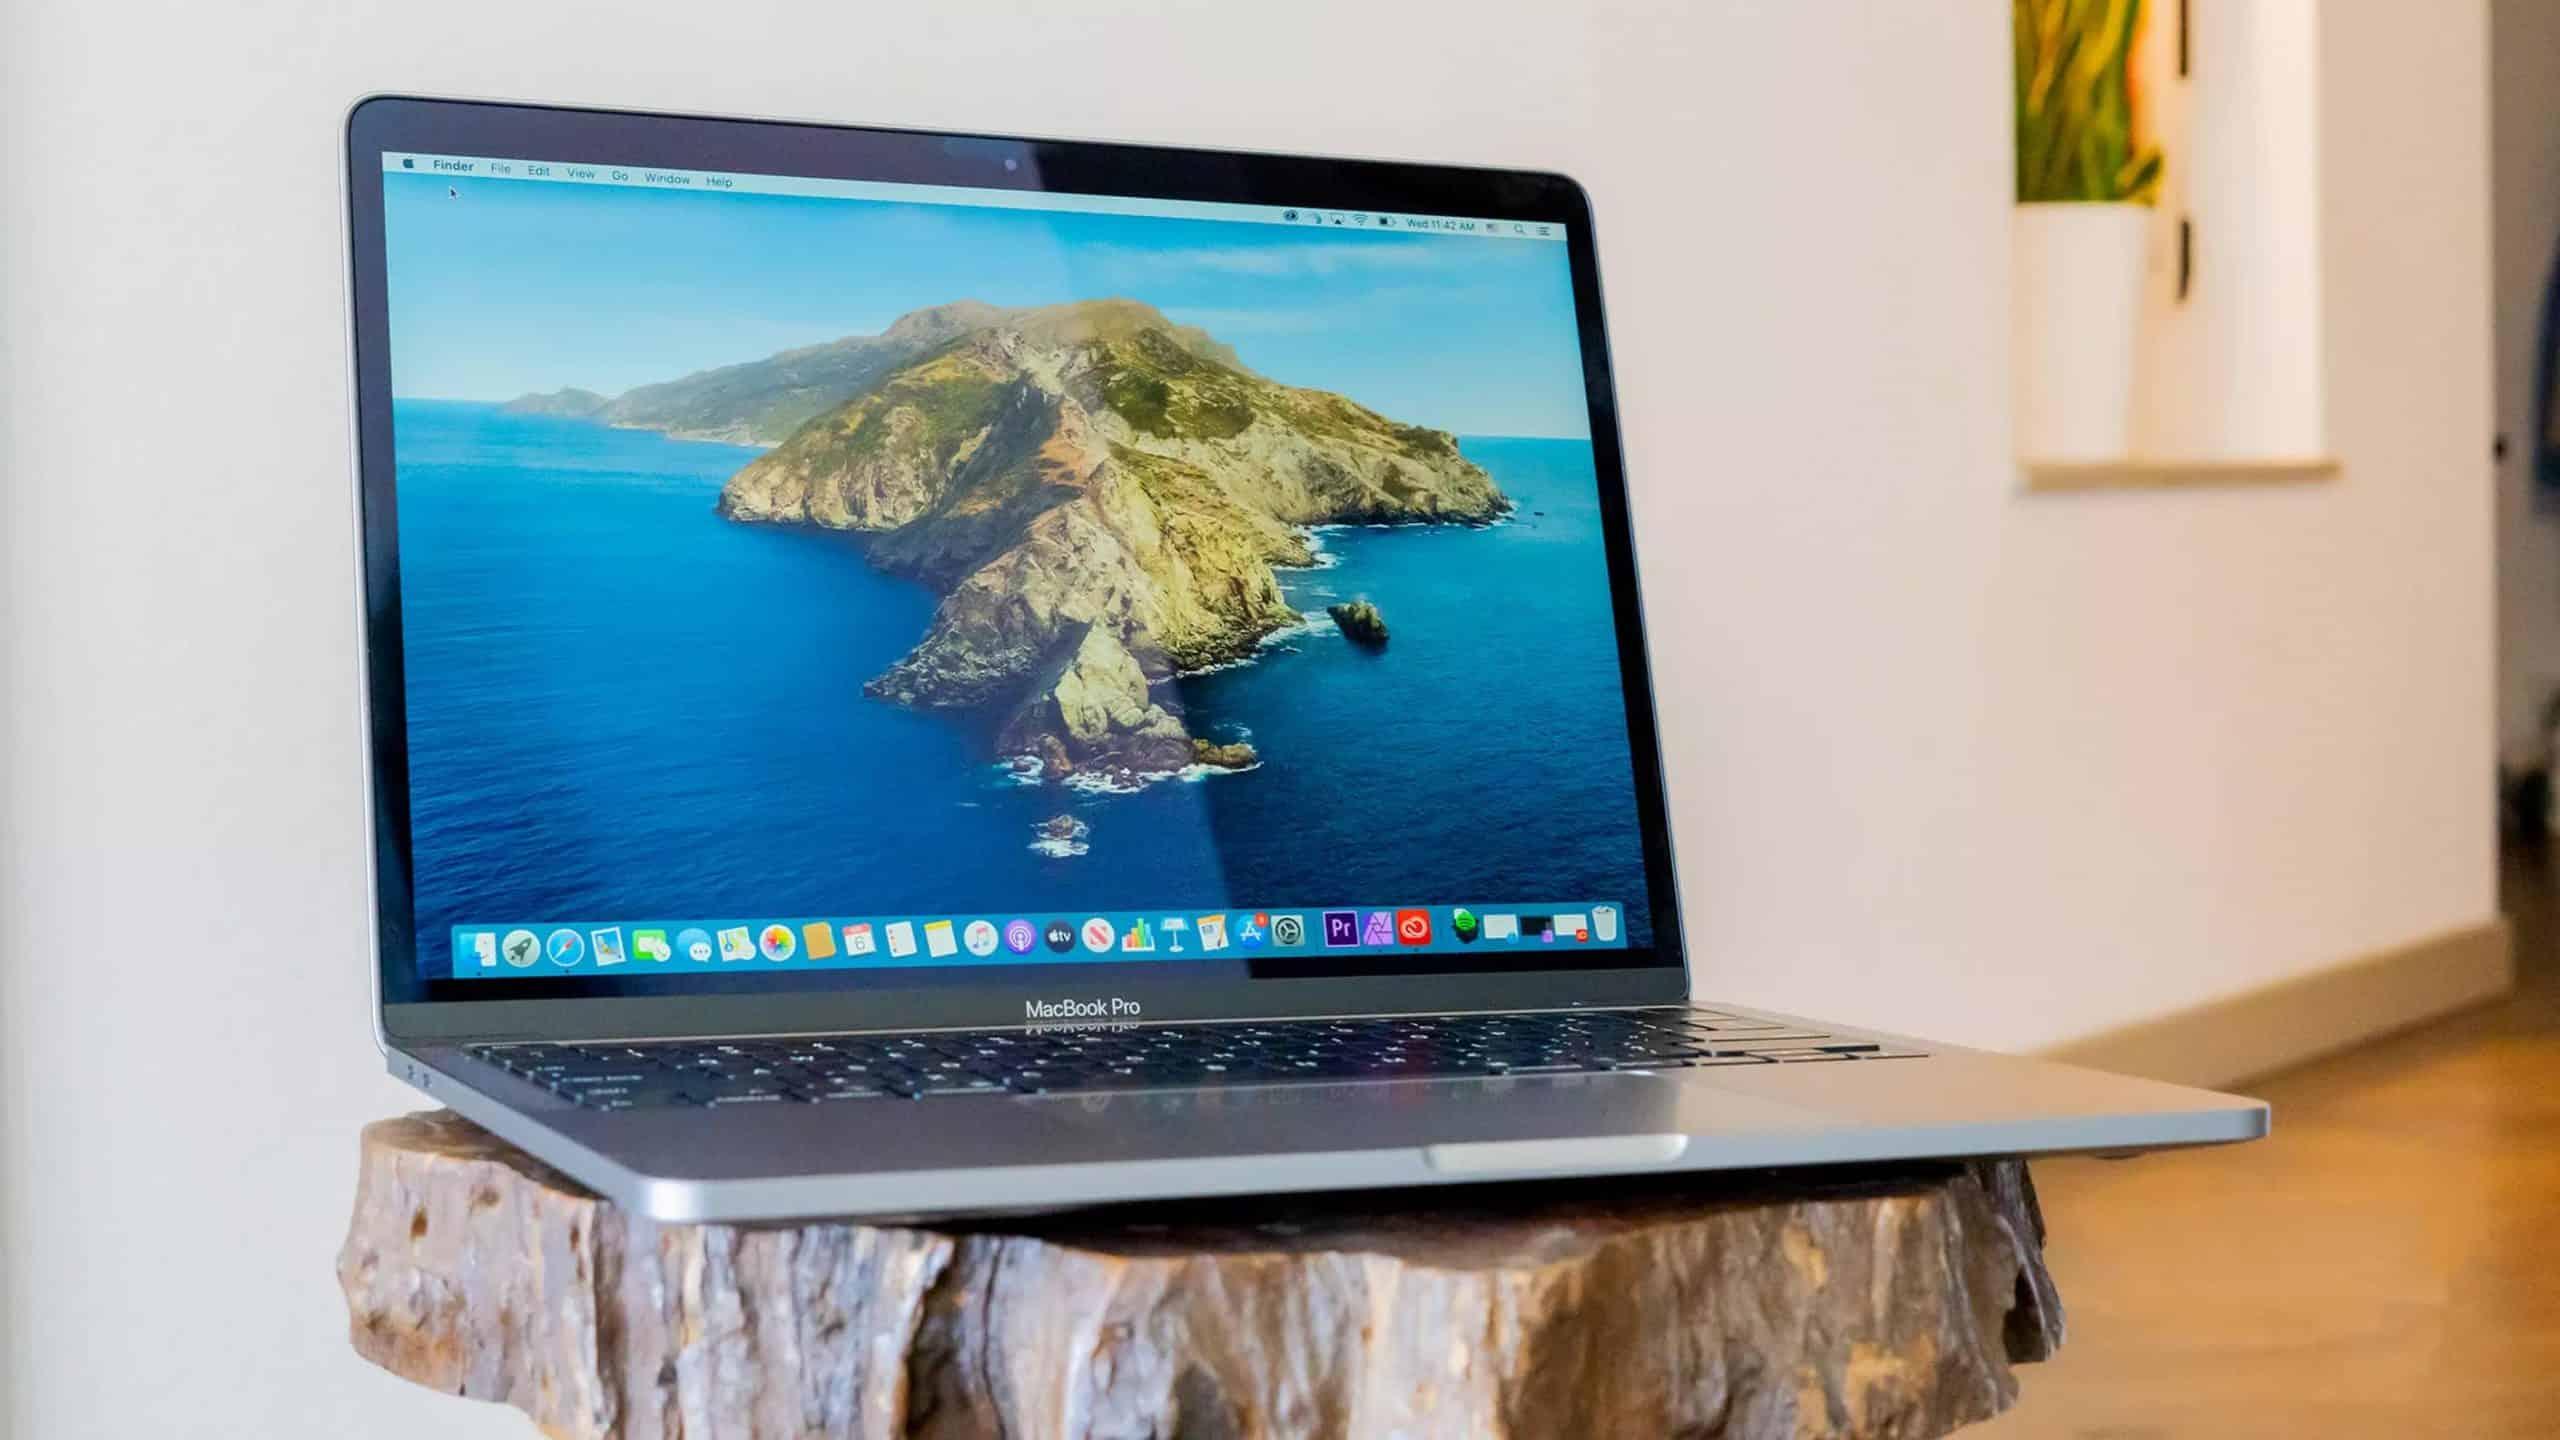 macbook pro 2020 space gray 13 inch laptopvang.com